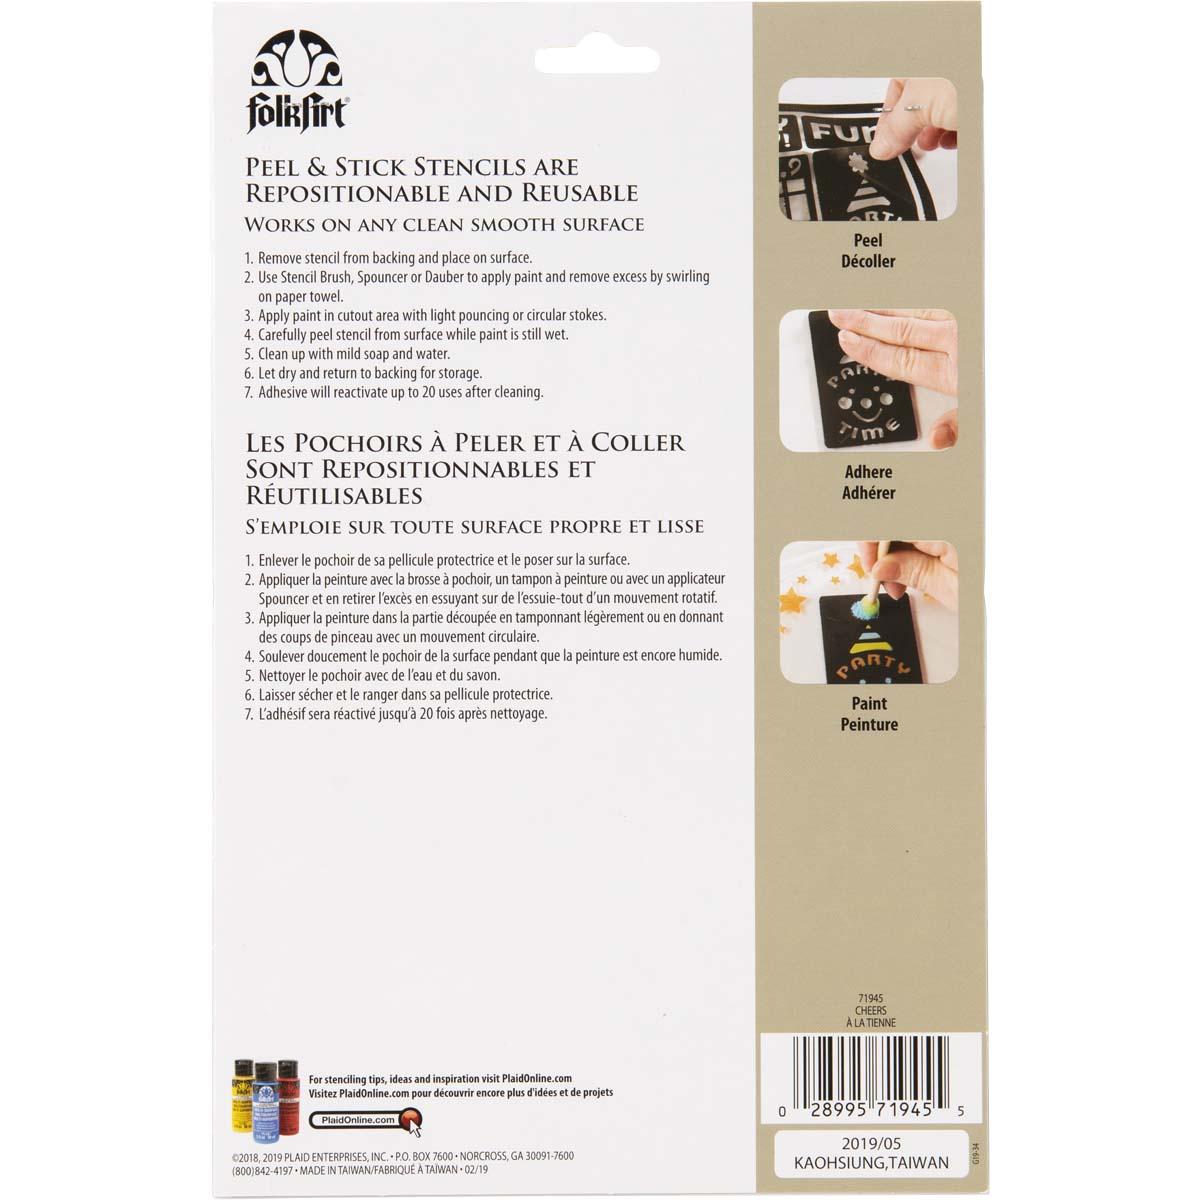 FolkArt ® Peel & Stick Painting Stencils - Cheers - 71945